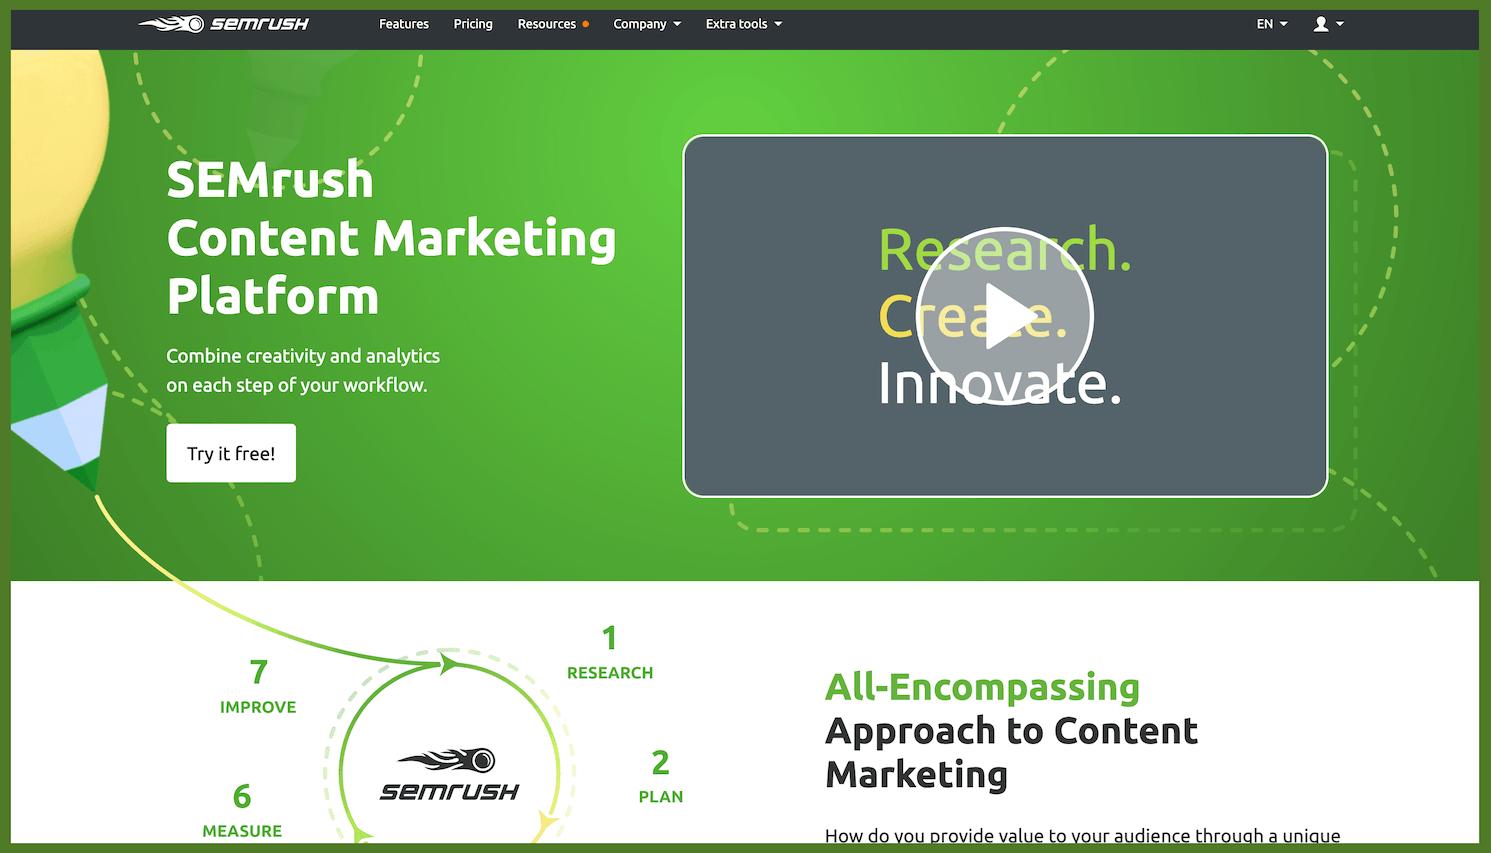 semrush-content-marketing-platform-semrush-content-marketing-toolkit